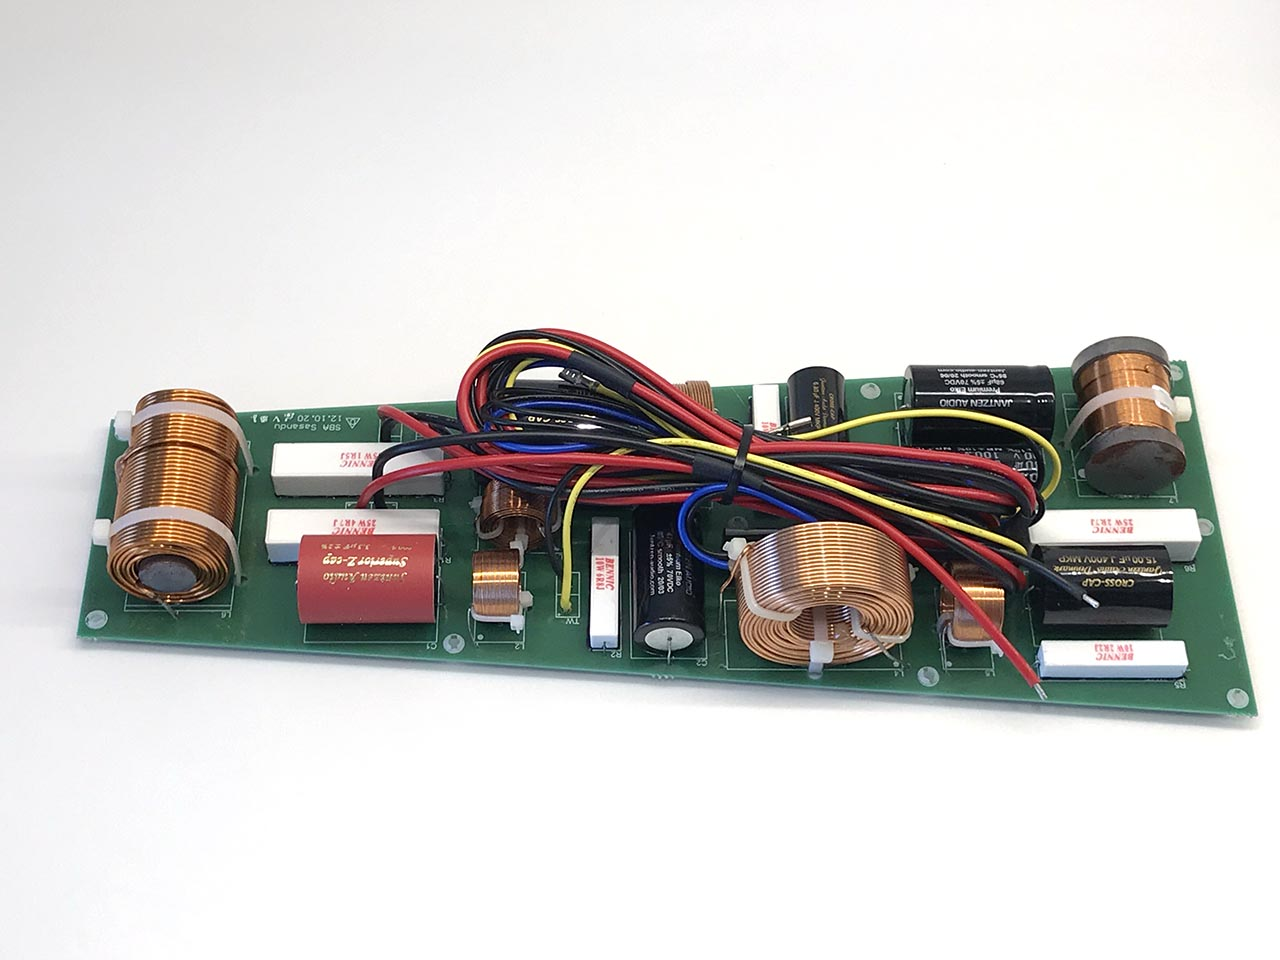 SB Acoustics Sasandu DIY Speaker kit factory crossover - Jantzen components